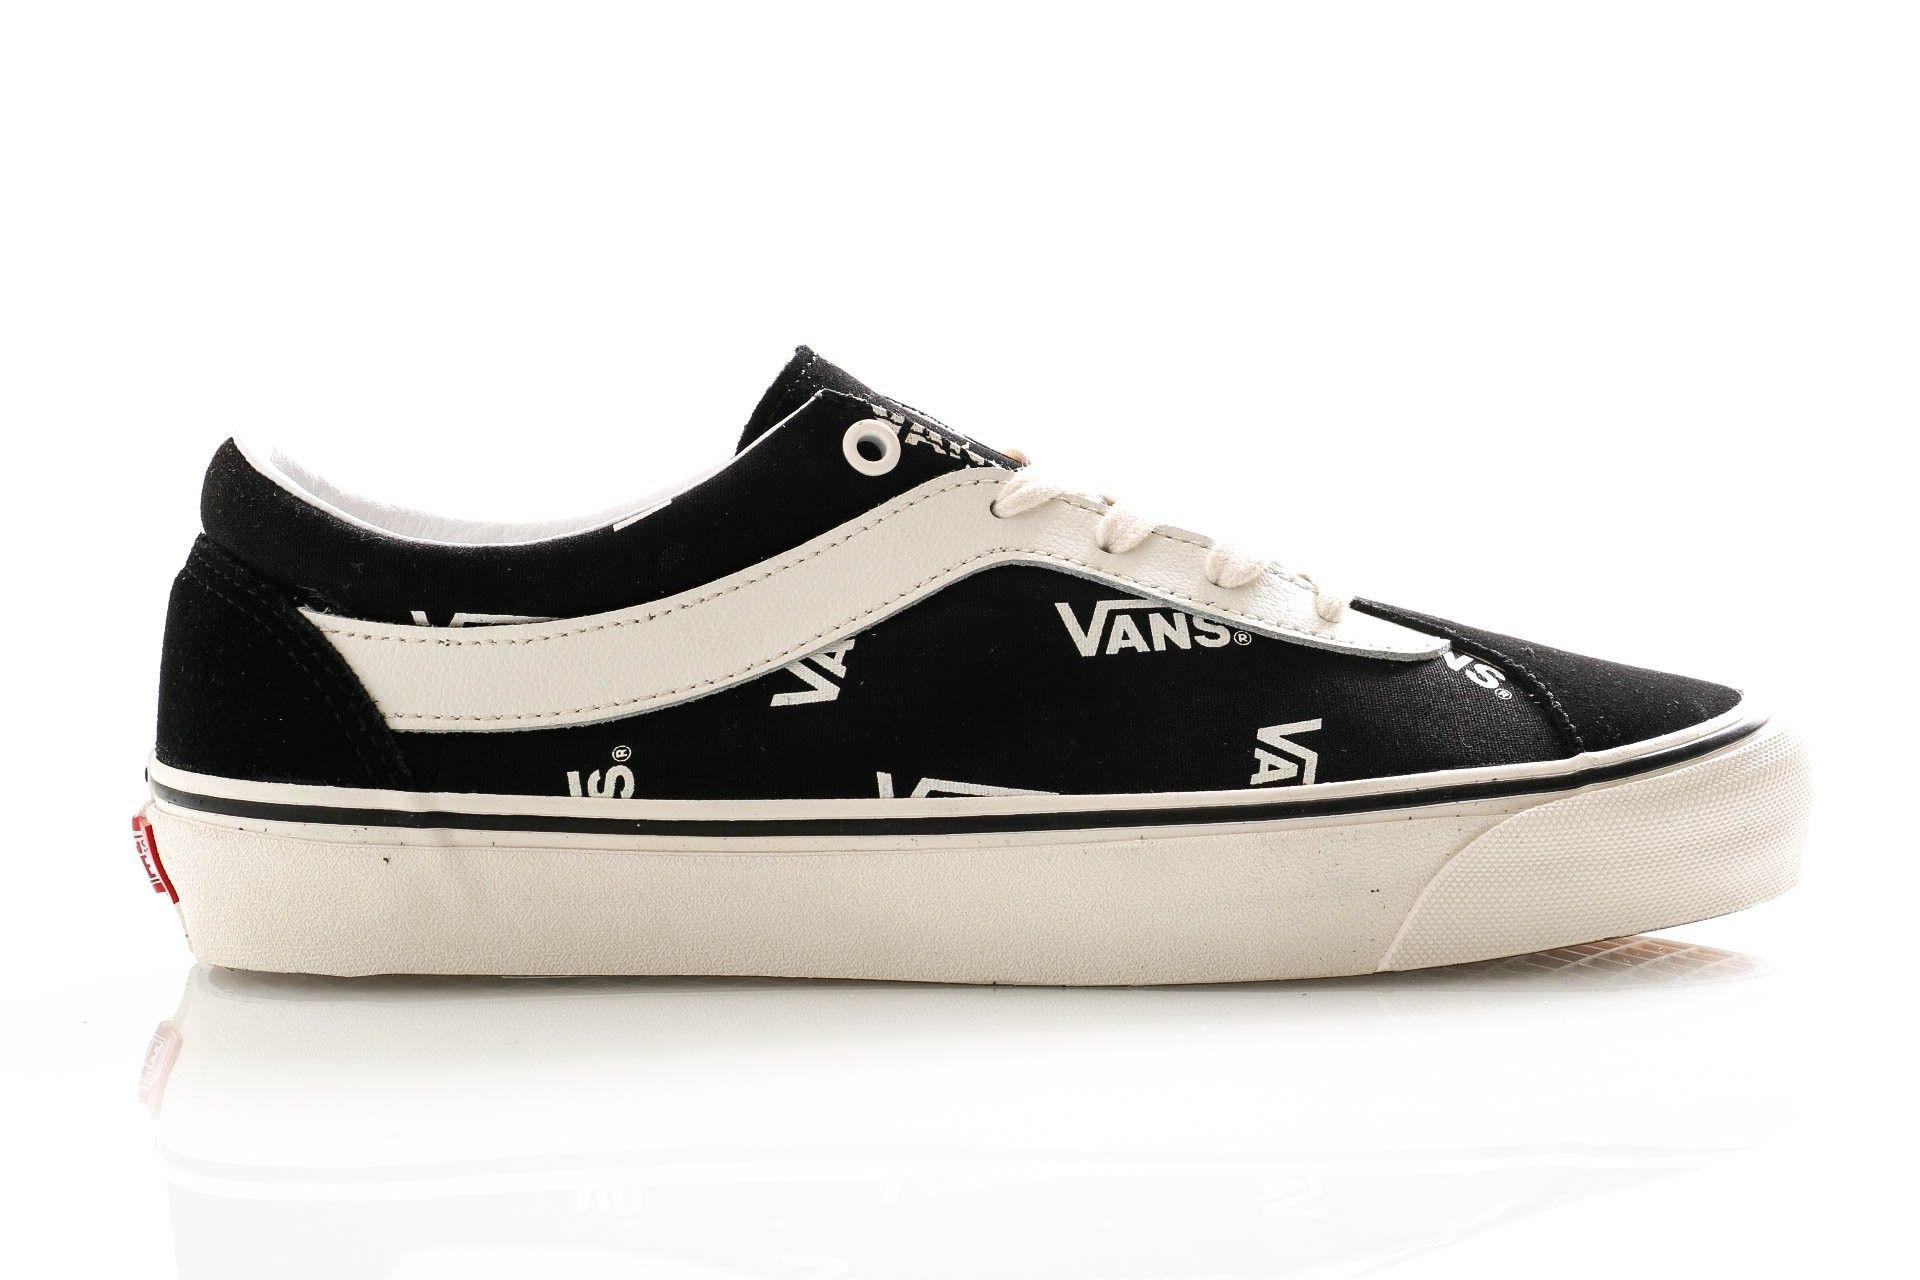 Afbeelding van Vans Sneakers Ua Bold Ni (Vans Block) Blk/Marshmlw VN0A3WLPWQW1